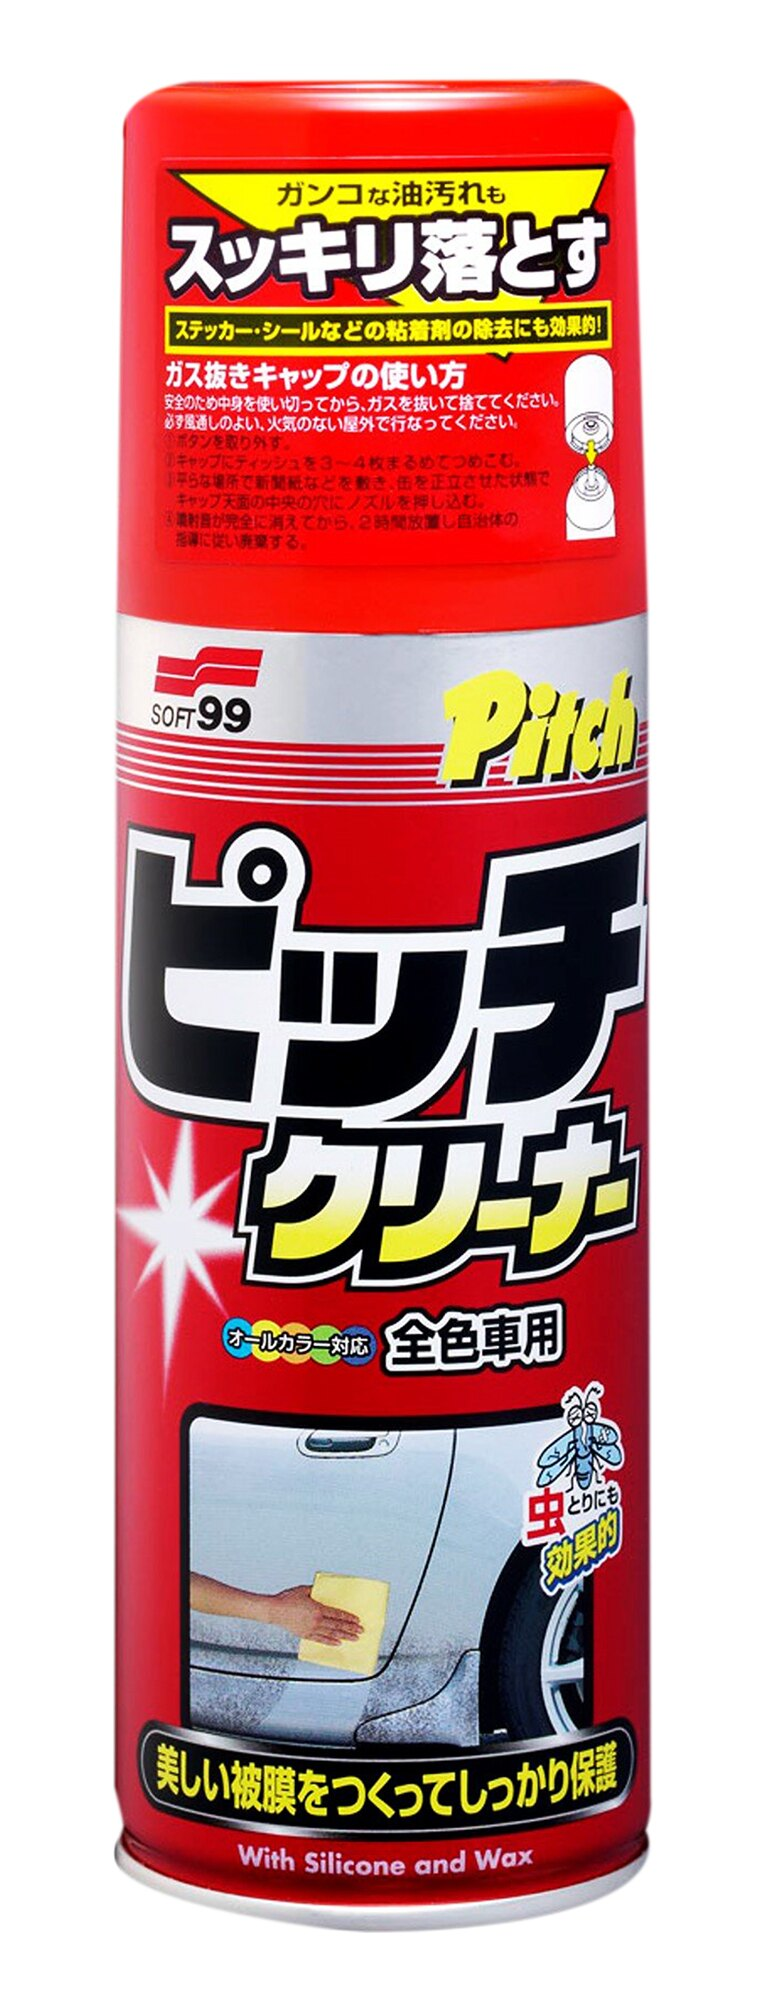 SOFT 99 Pitch 新柏油清潔劑  C240  # 0264